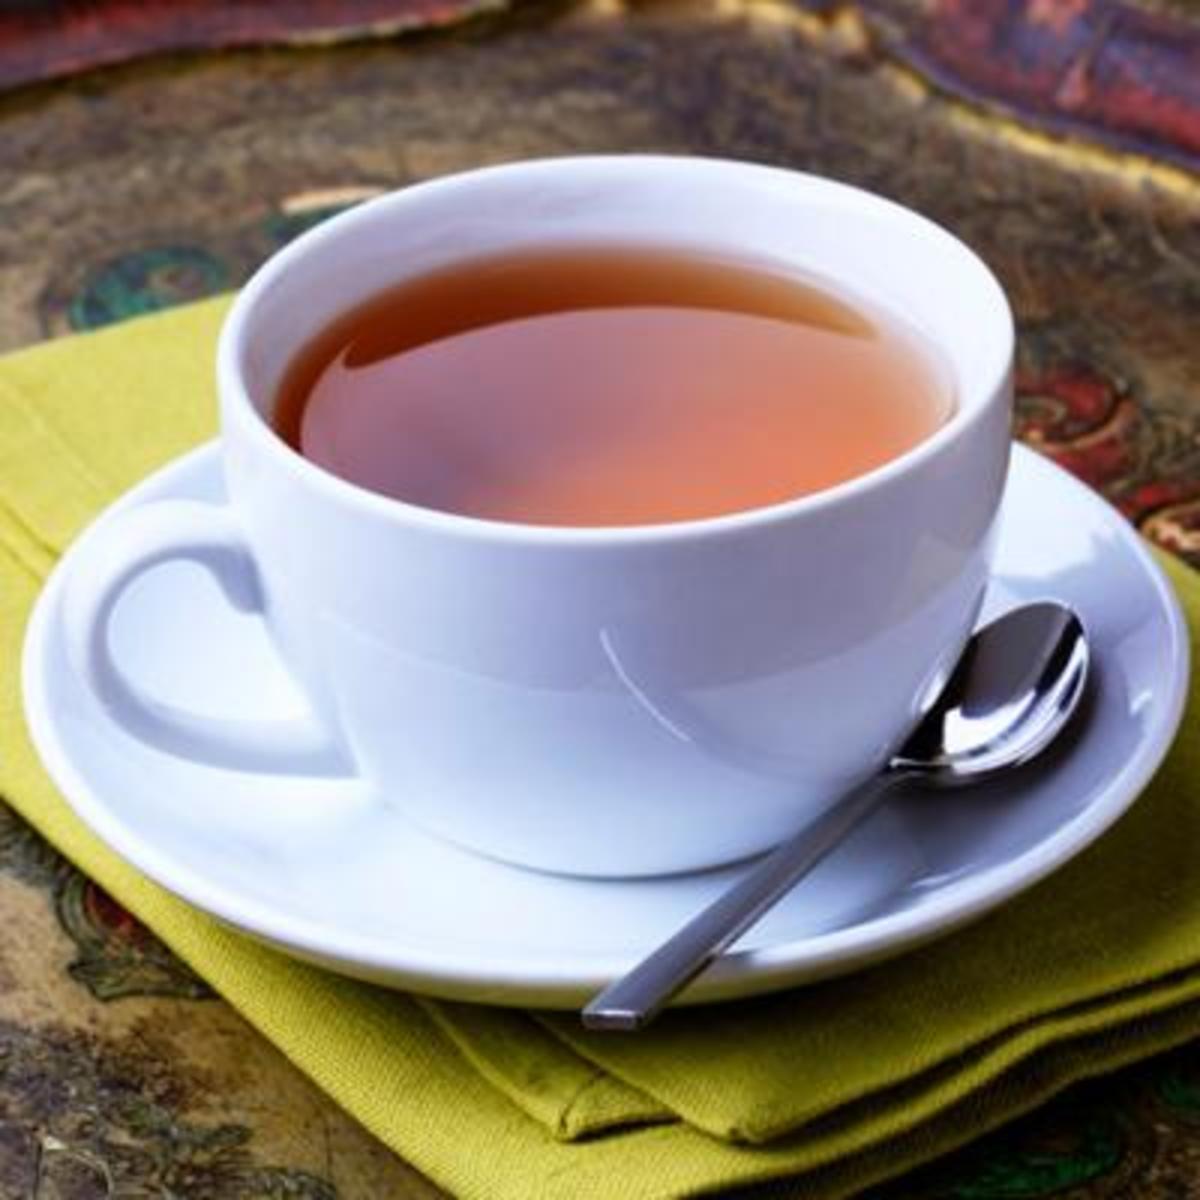 Drinking licorice tea can help you grow healthier hair!